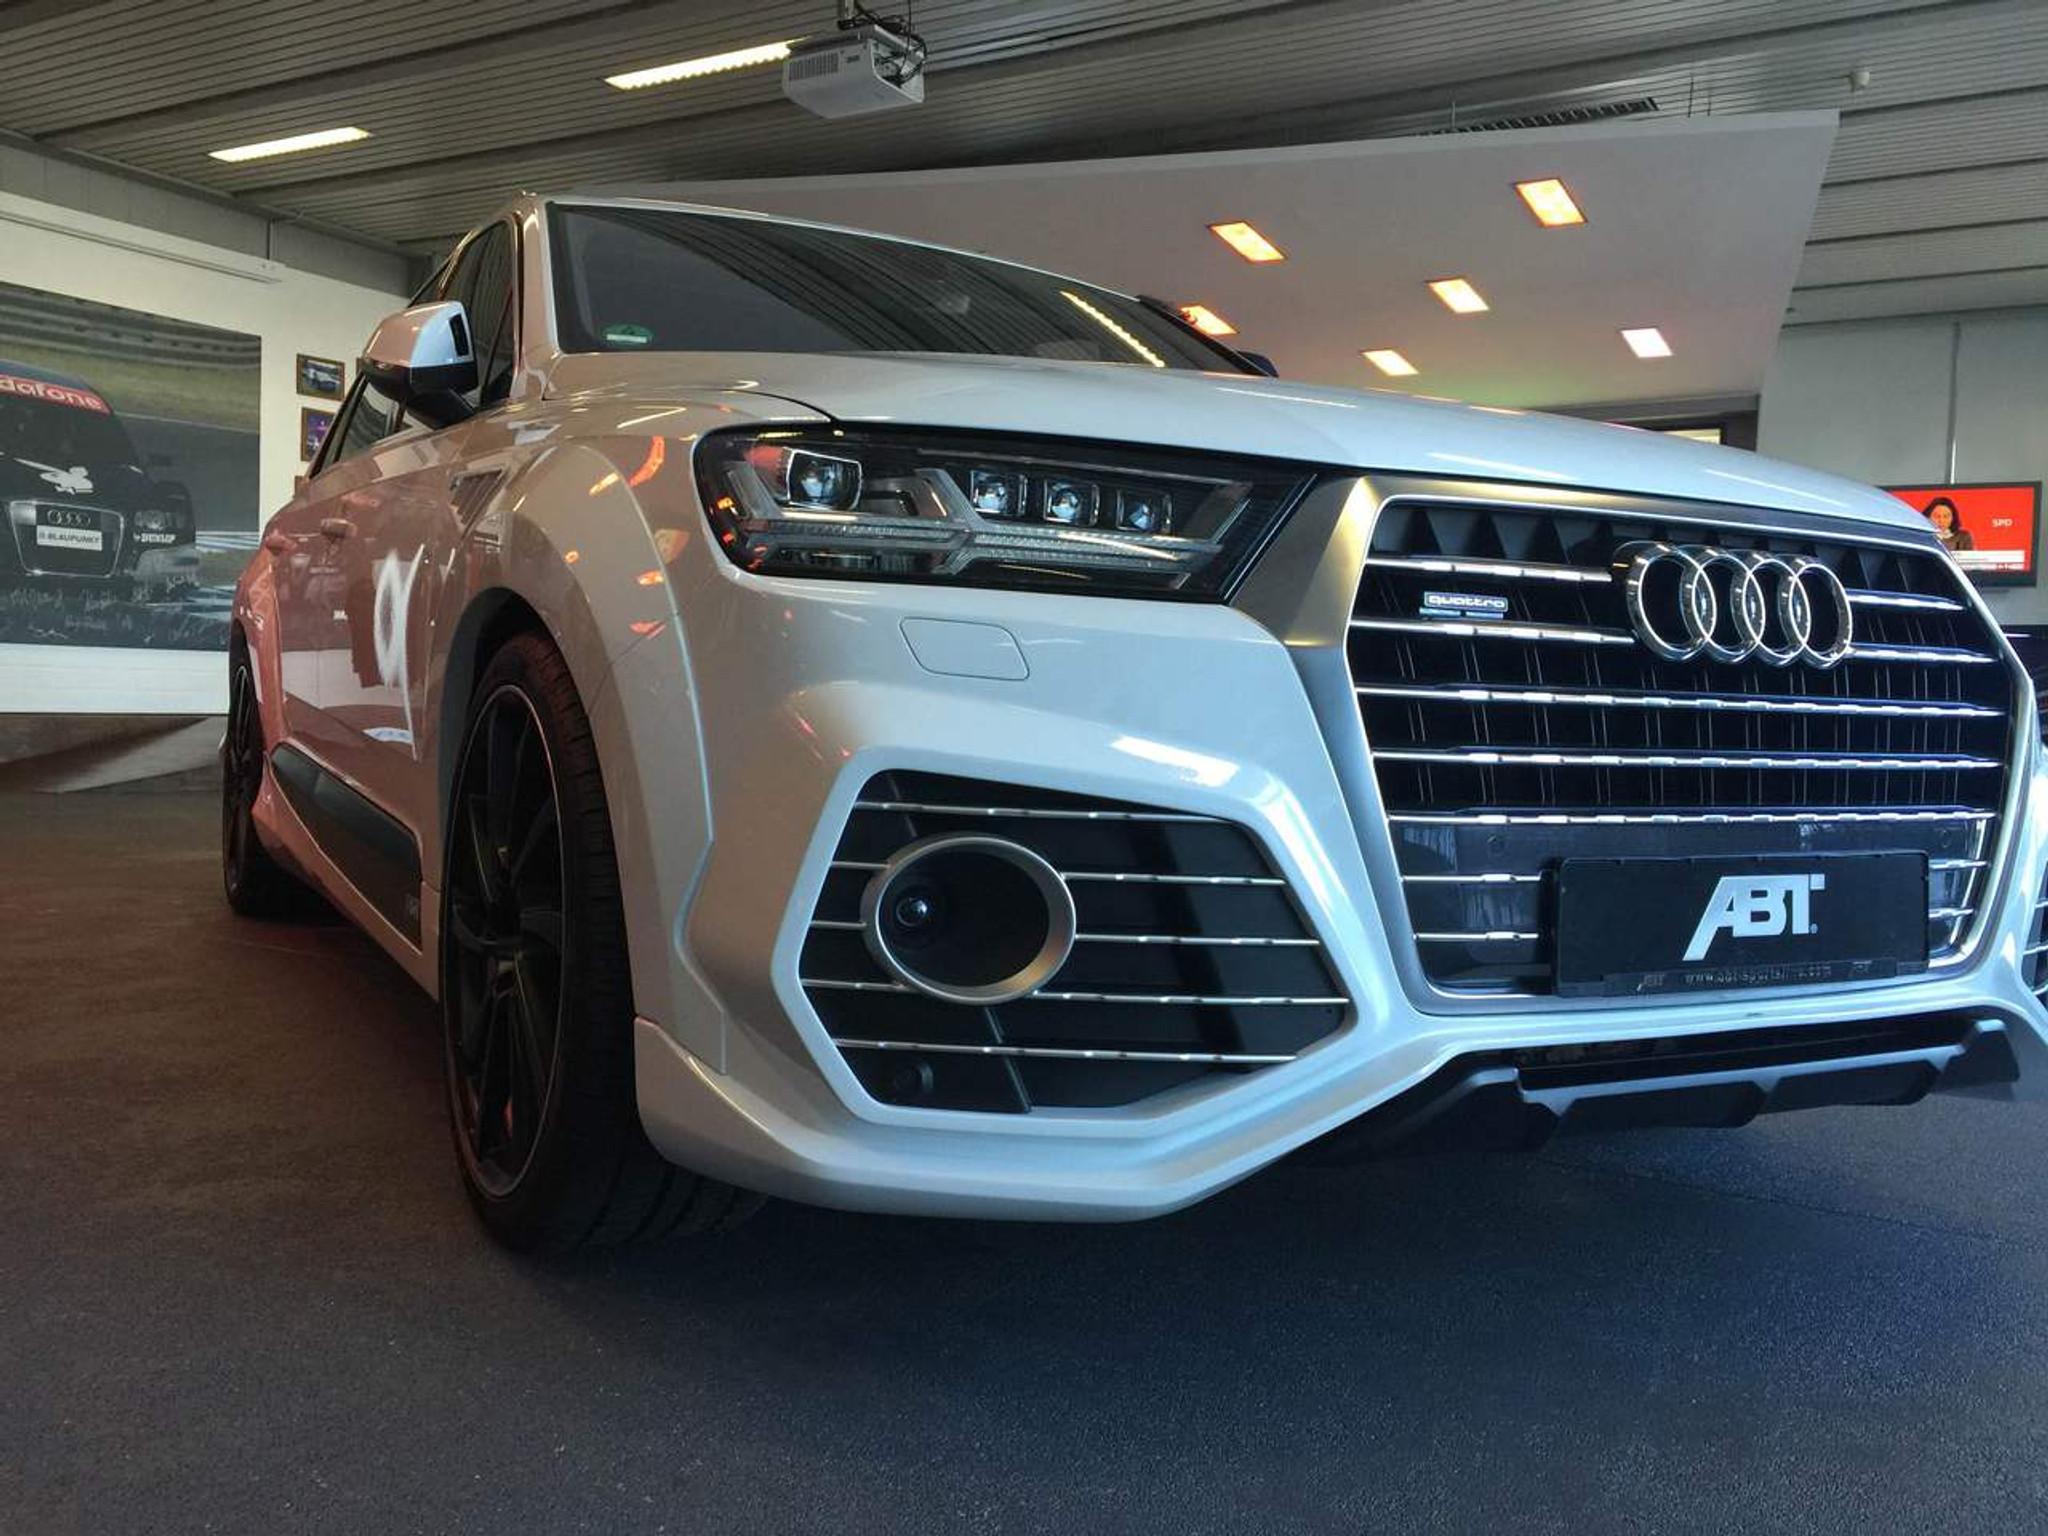 Audi Sq7 2016 Abt Wide Body Kit Meduza Design Ltd